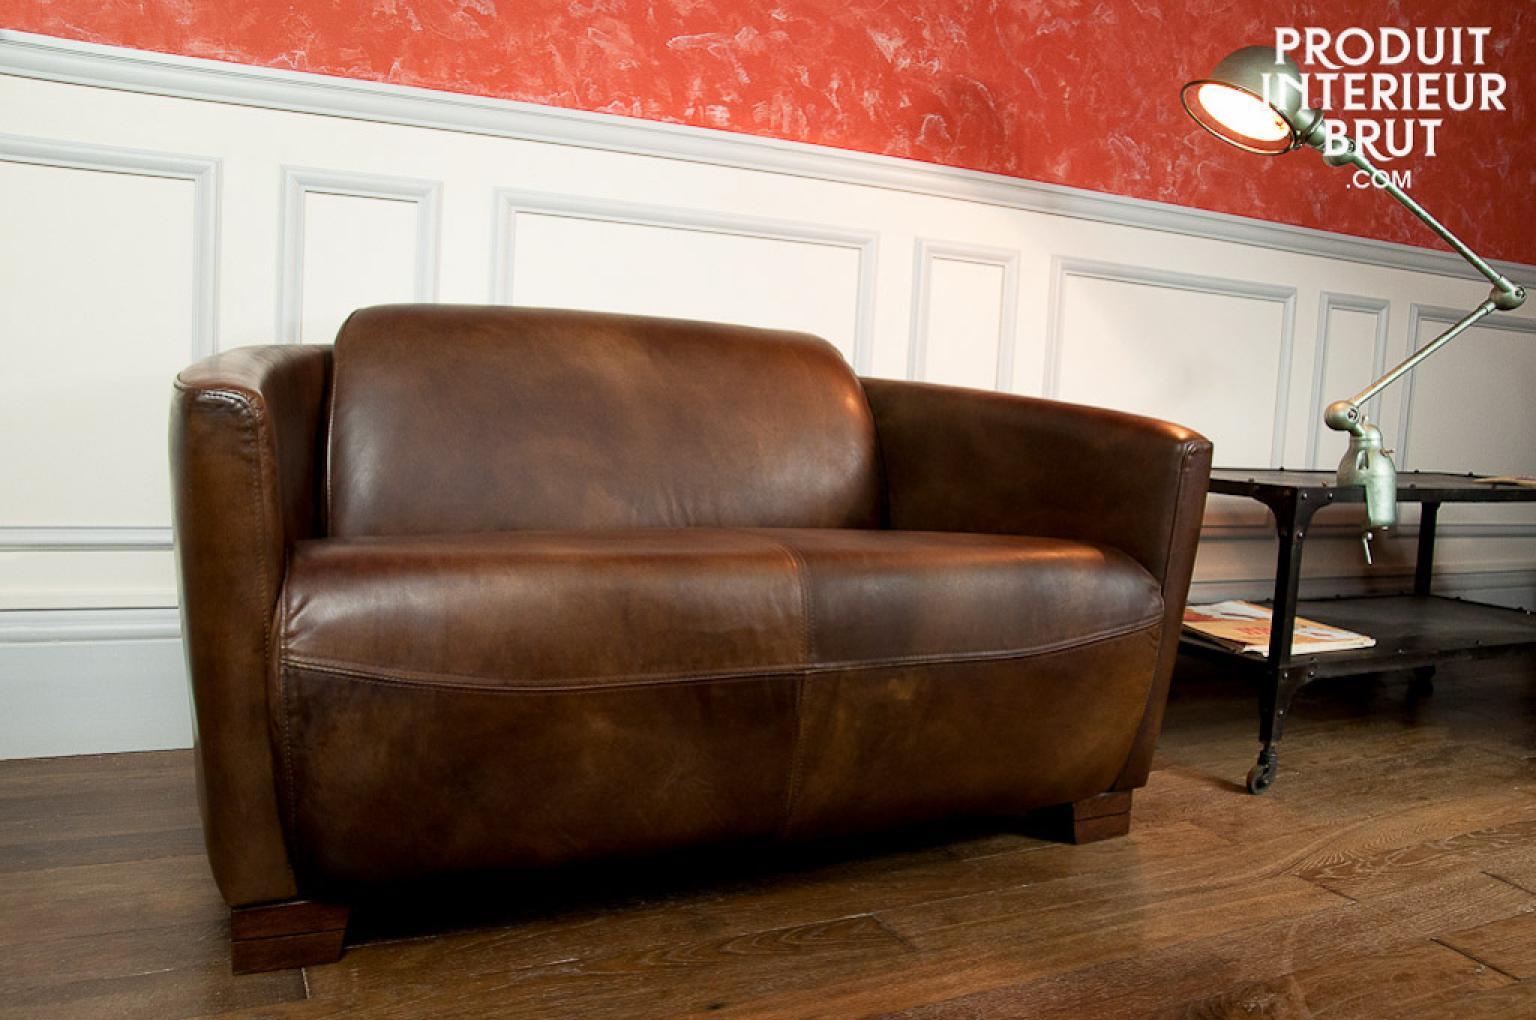 photos canap style industriel. Black Bedroom Furniture Sets. Home Design Ideas